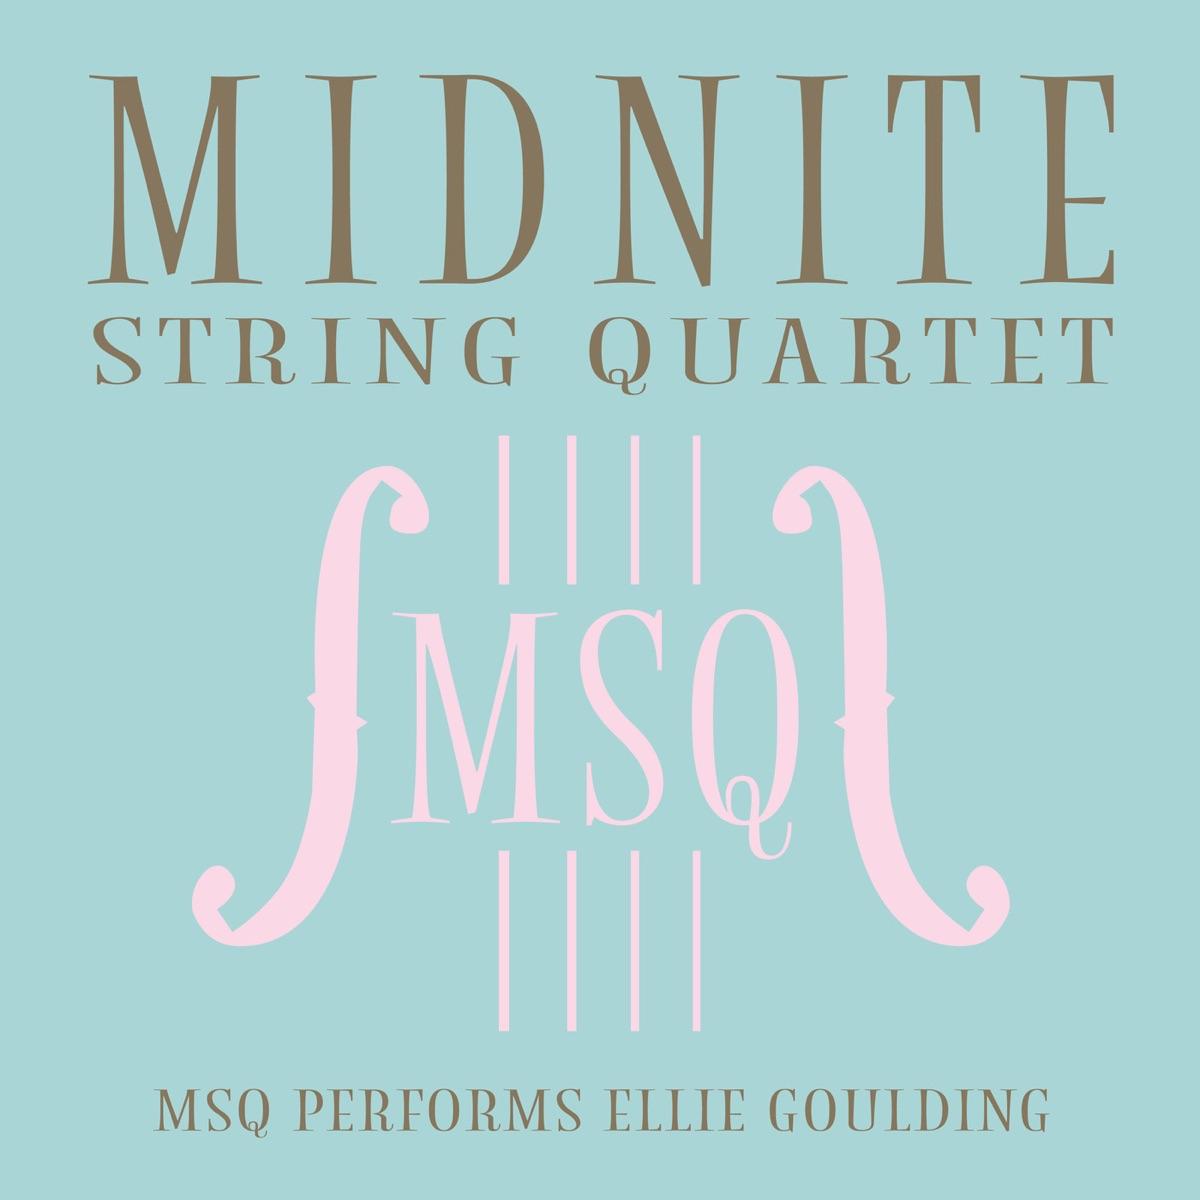 MSQ Performs Ellie Goulding Midnite String Quartet CD cover